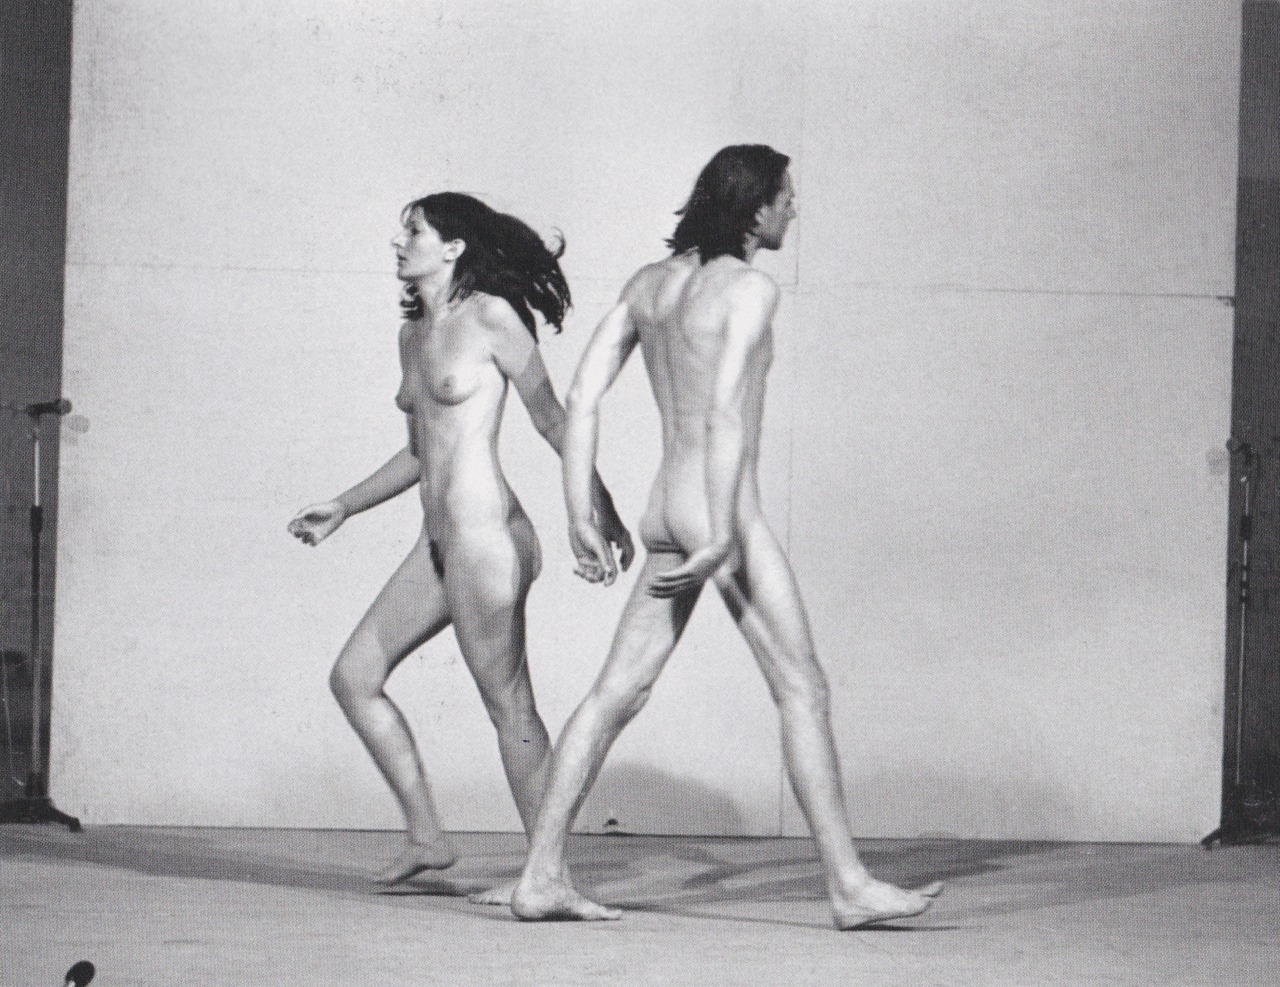 """Relation in Space""Relation in Space, Marina Abramović & Ulay, 1975, Venice (Foto Venezia Biennale)"